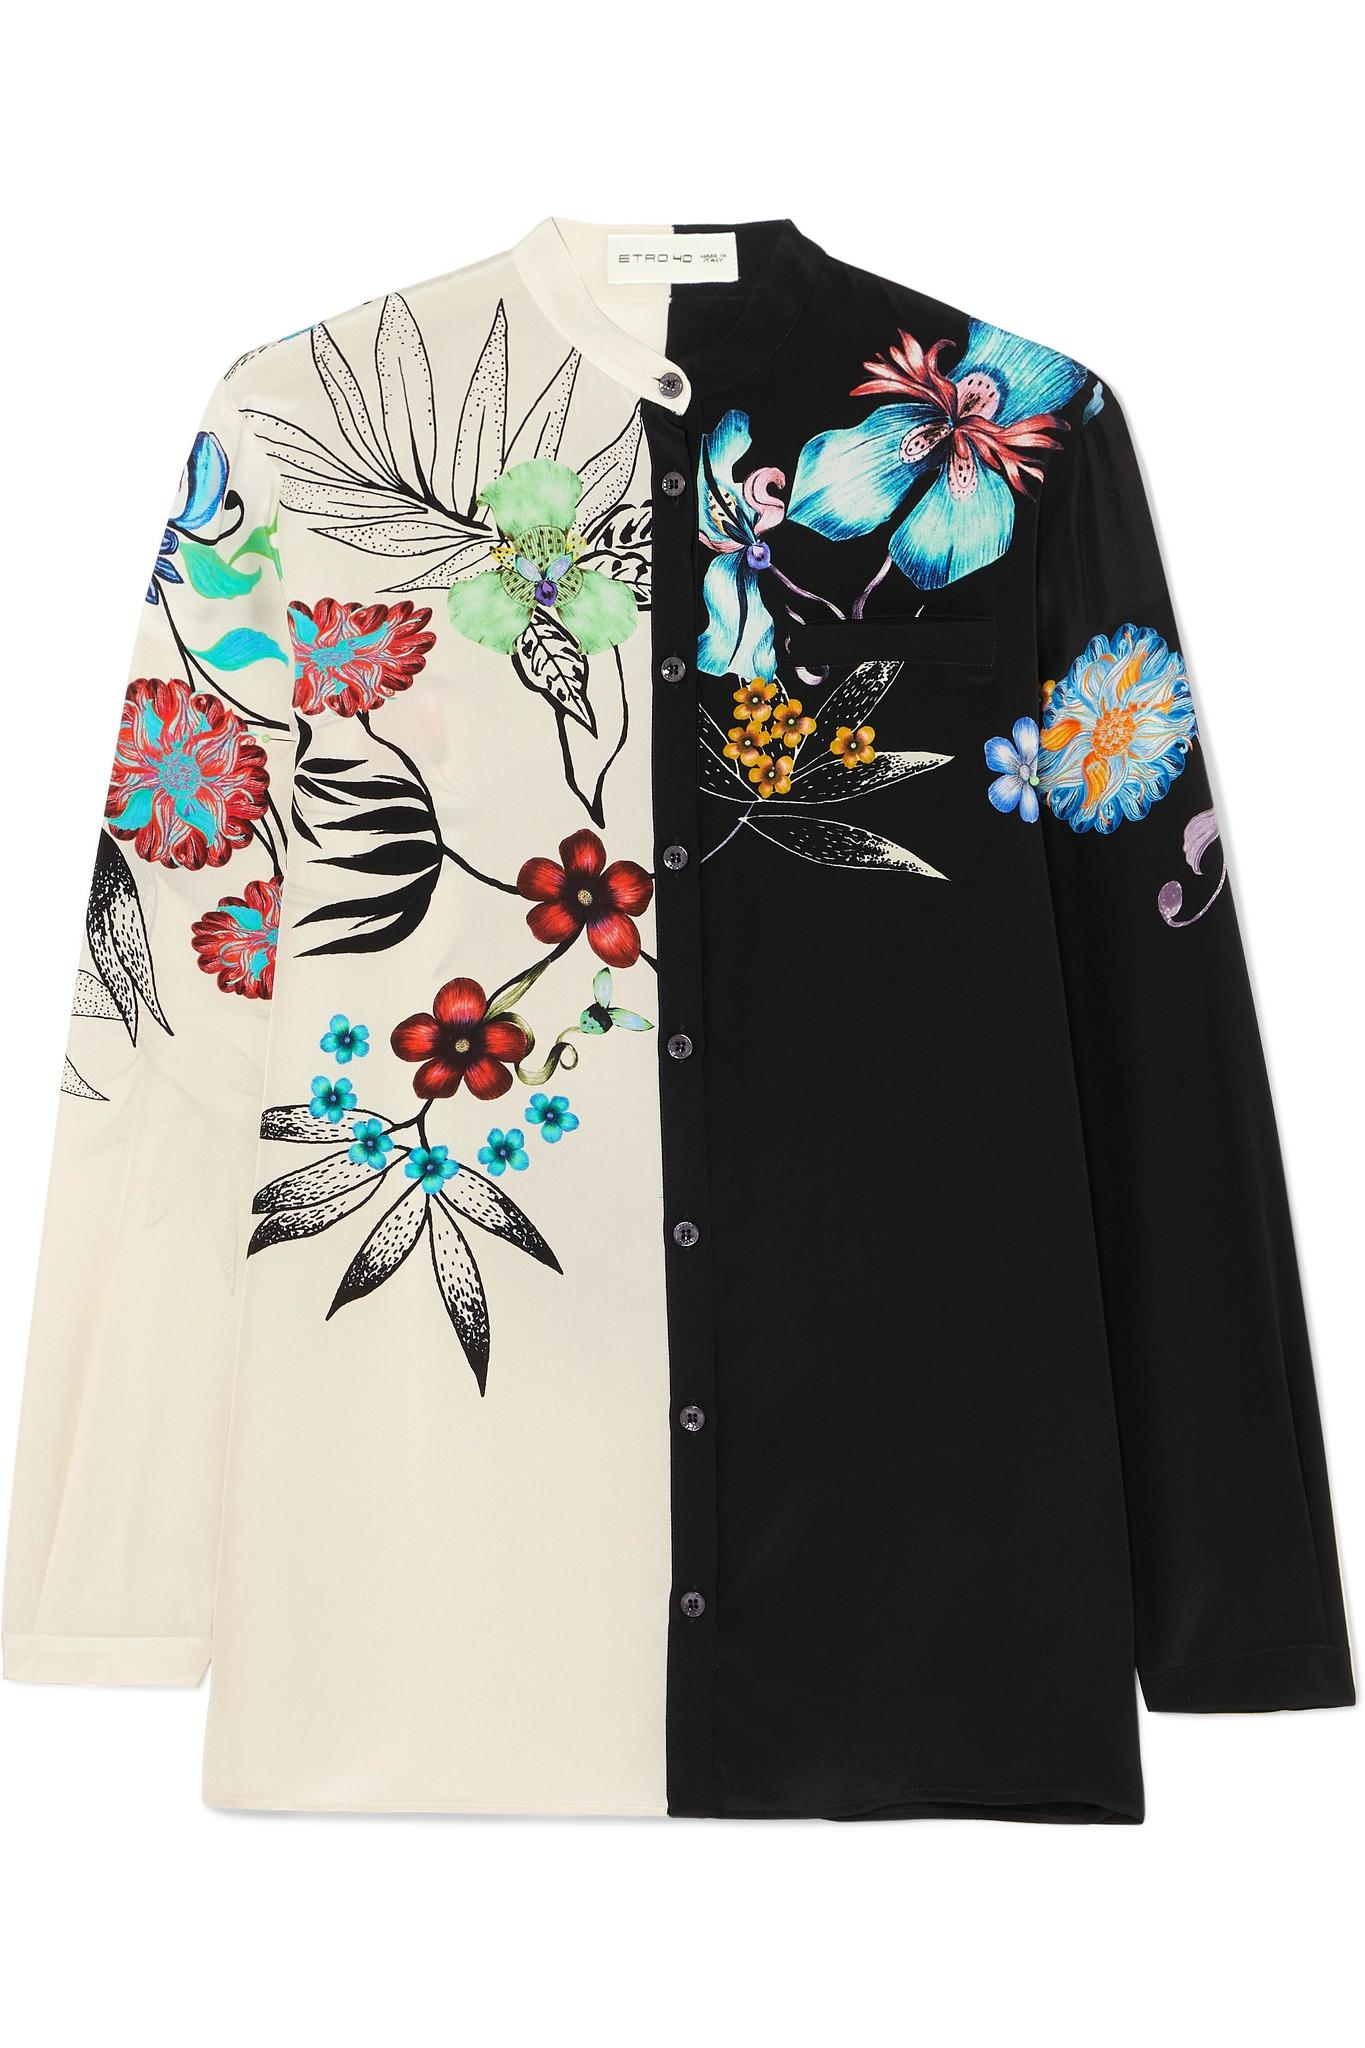 d6f6c9564530f Lyst - Etro Floral-print Silk Shirt in Black - Save 30%